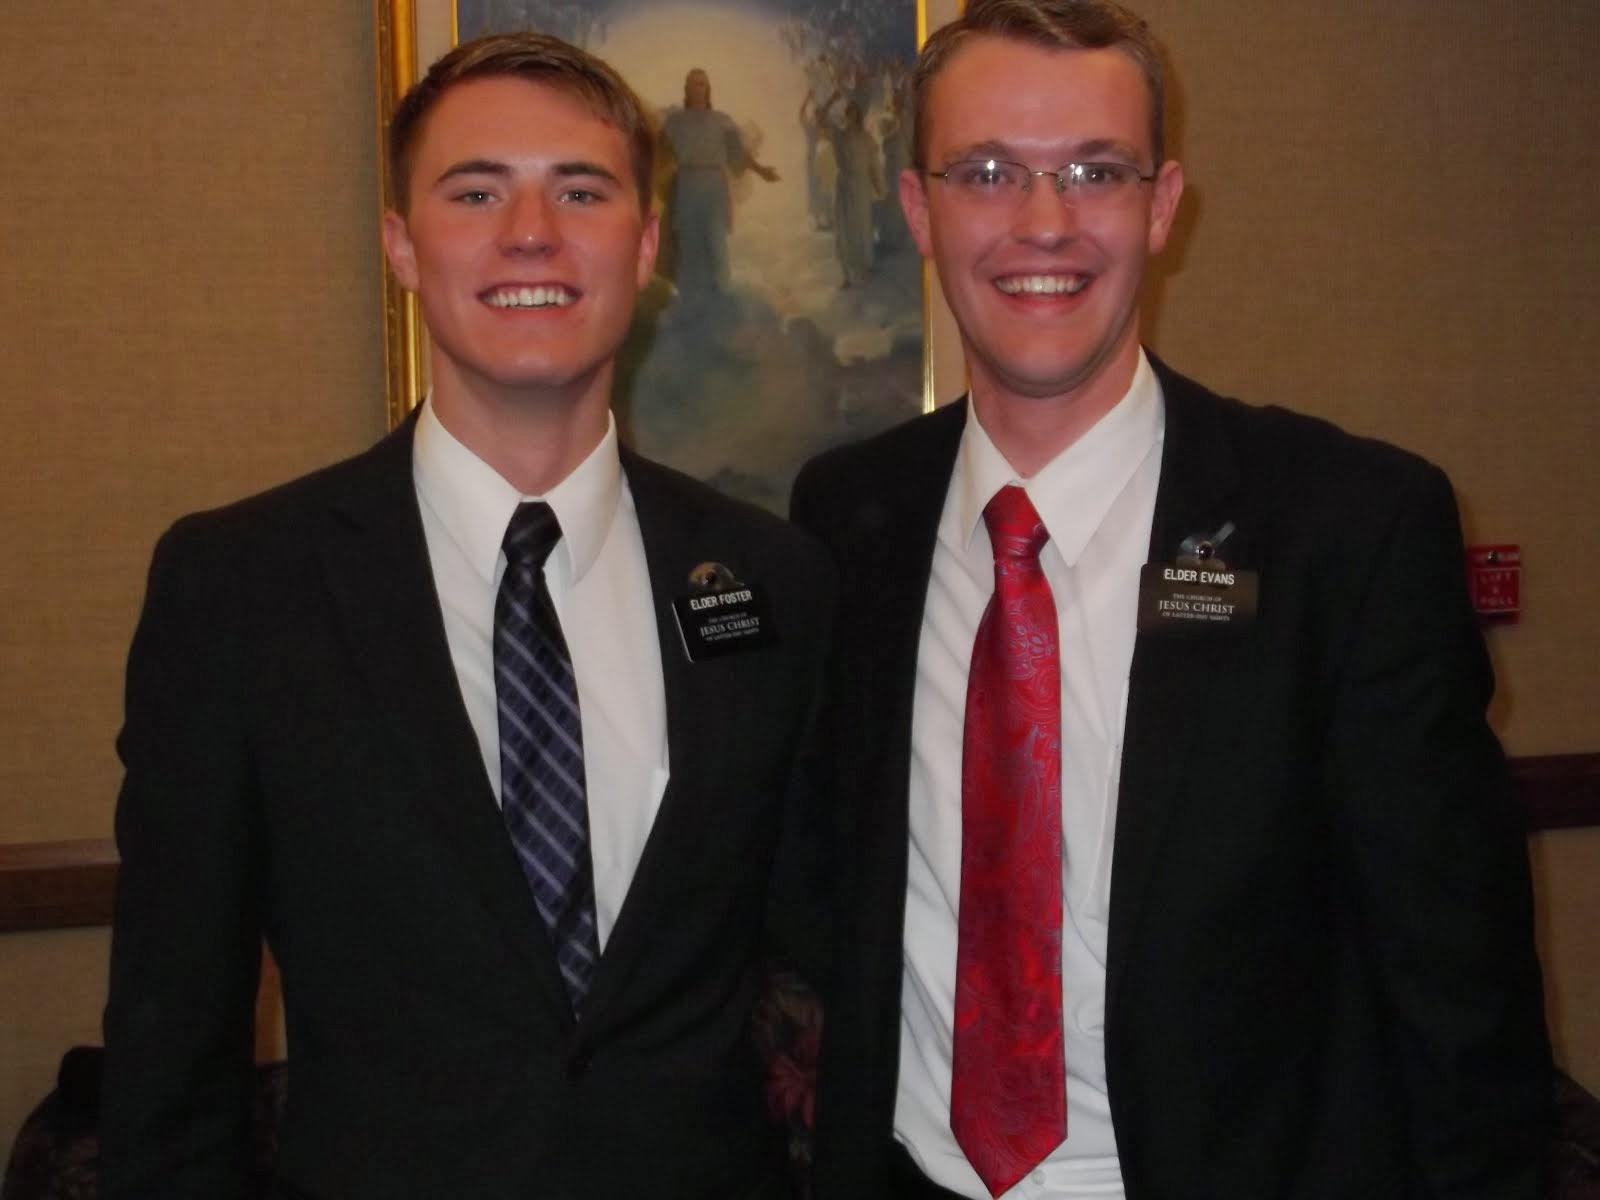 Elder Foster & Elder Evans